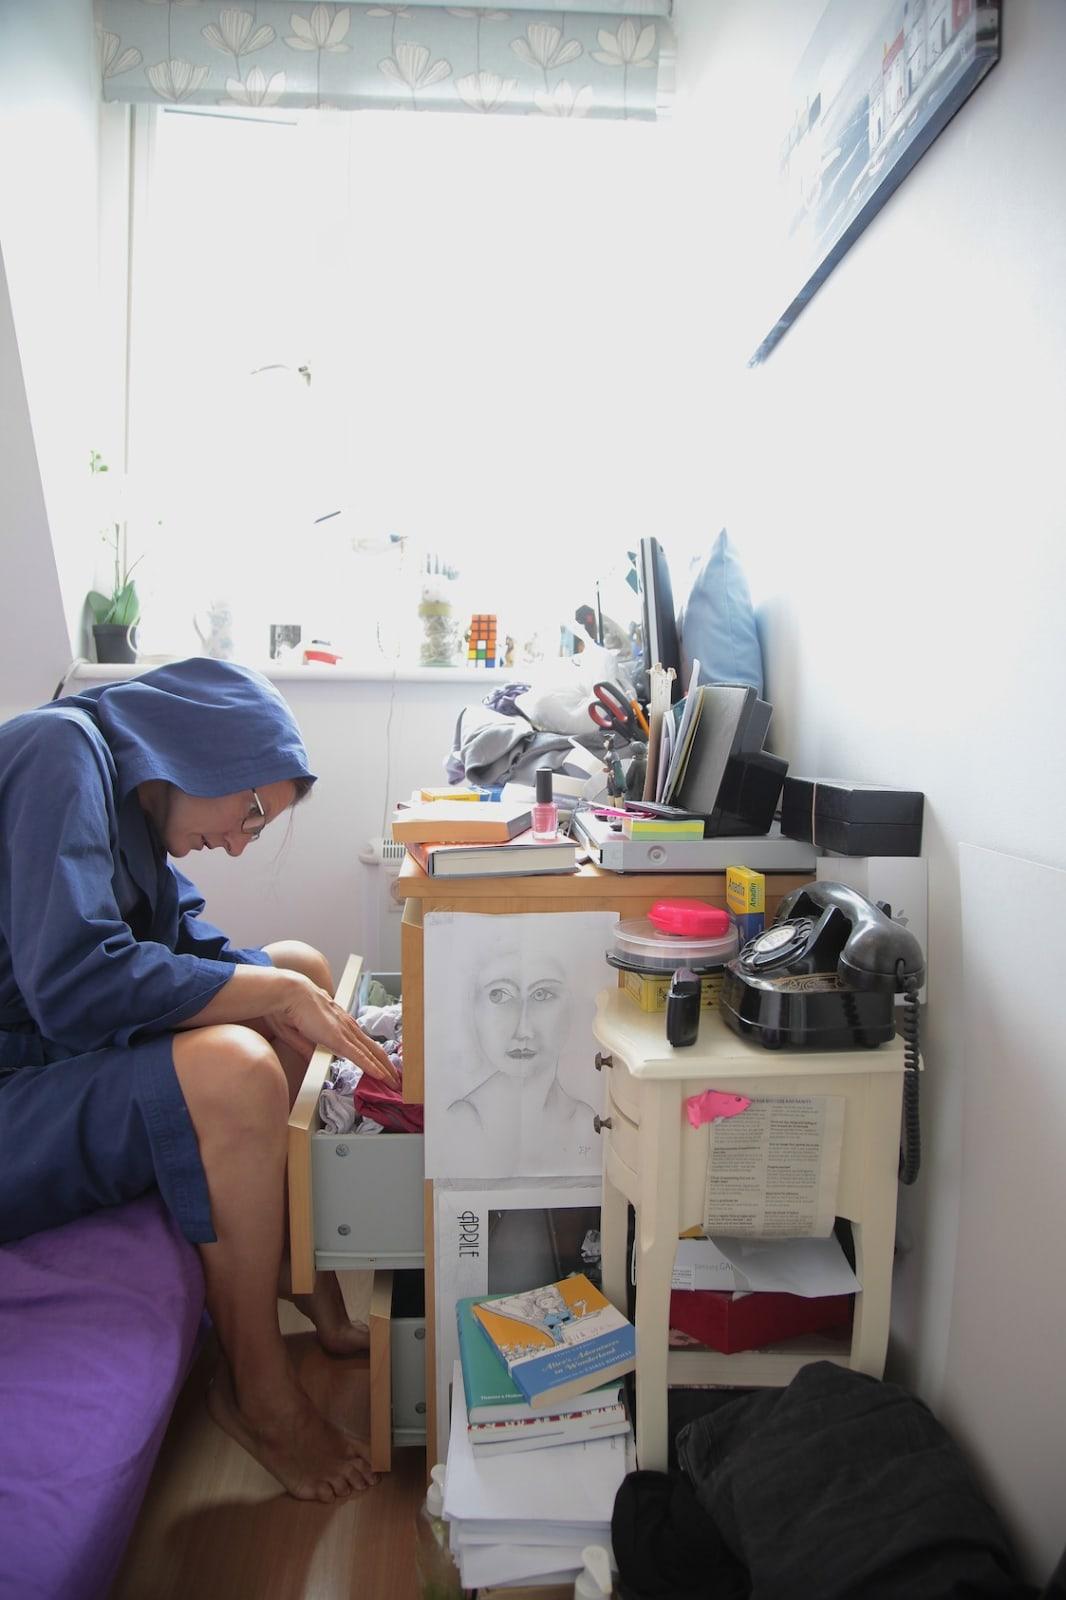 Lichena Bertinato, I live here Pic. No. 5, 2015